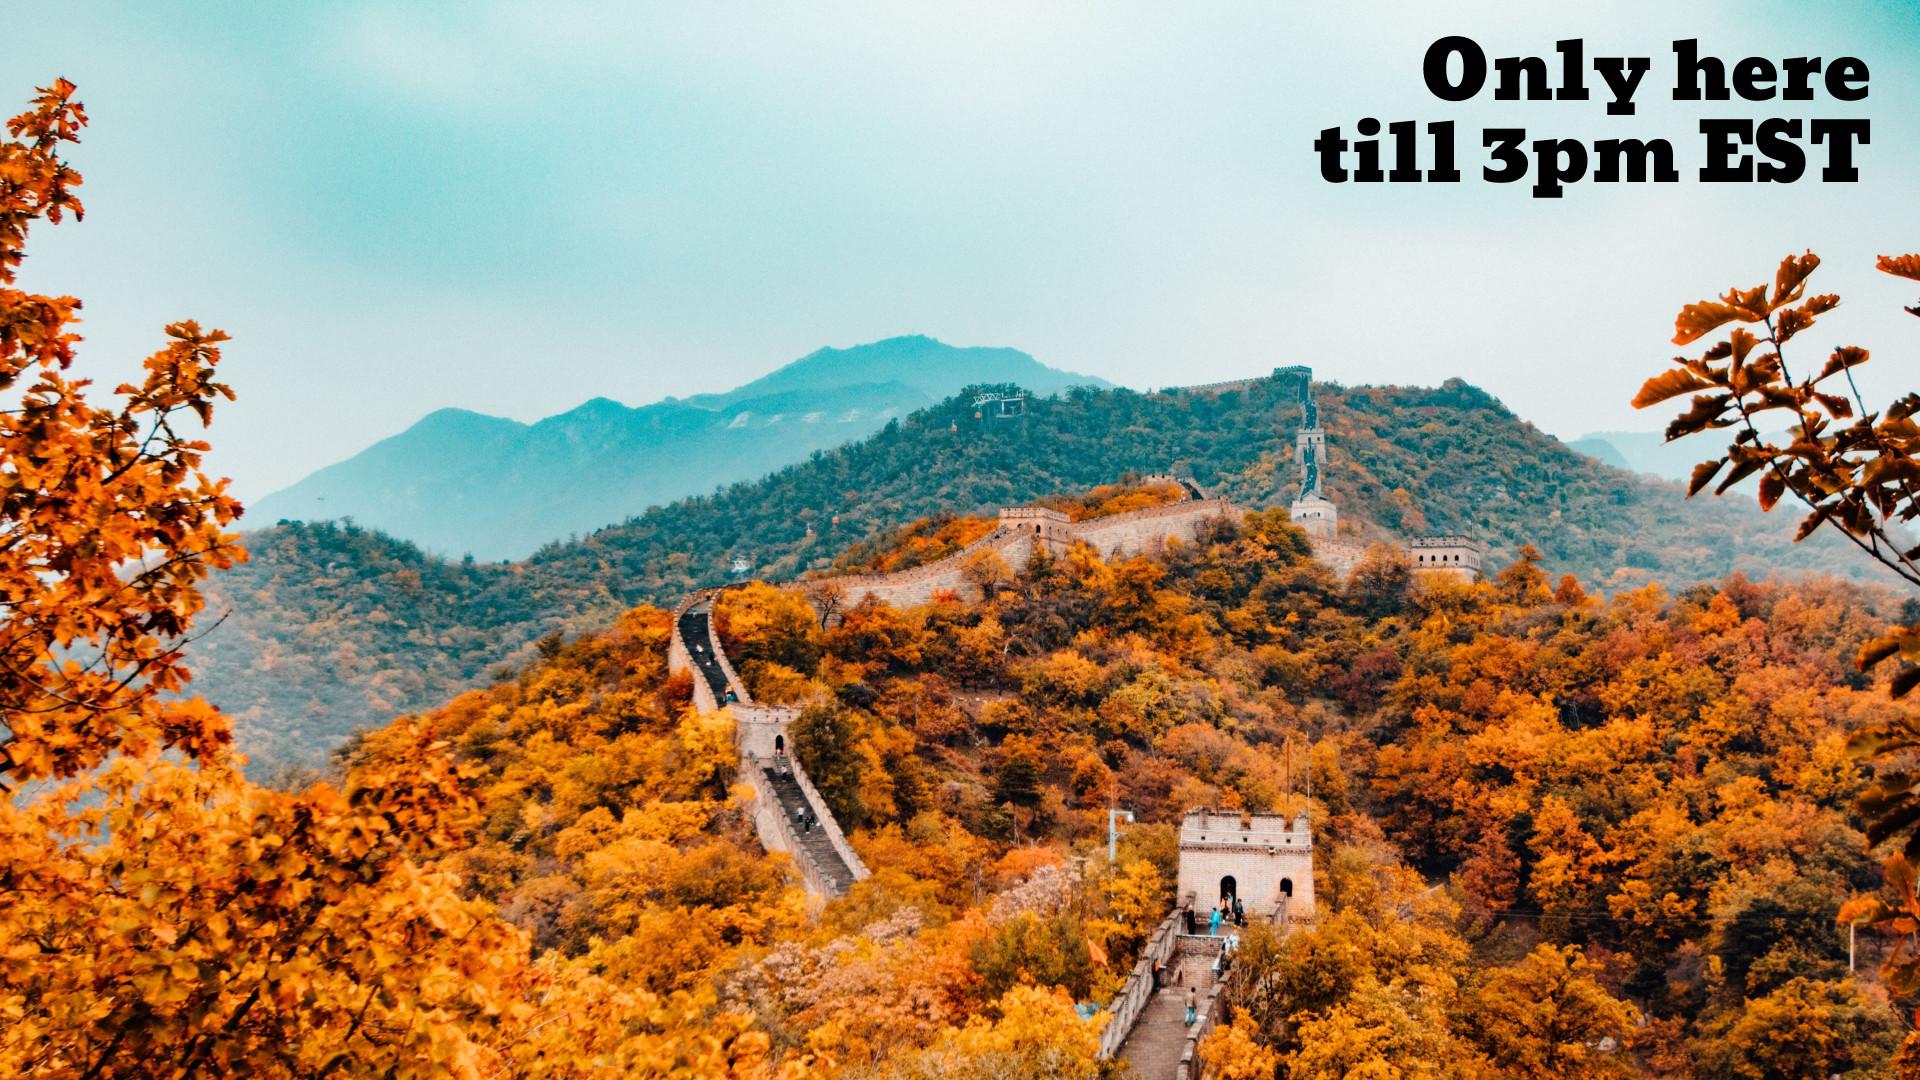 Autumn Landscape - Leaving Office Zoom Virtual Background